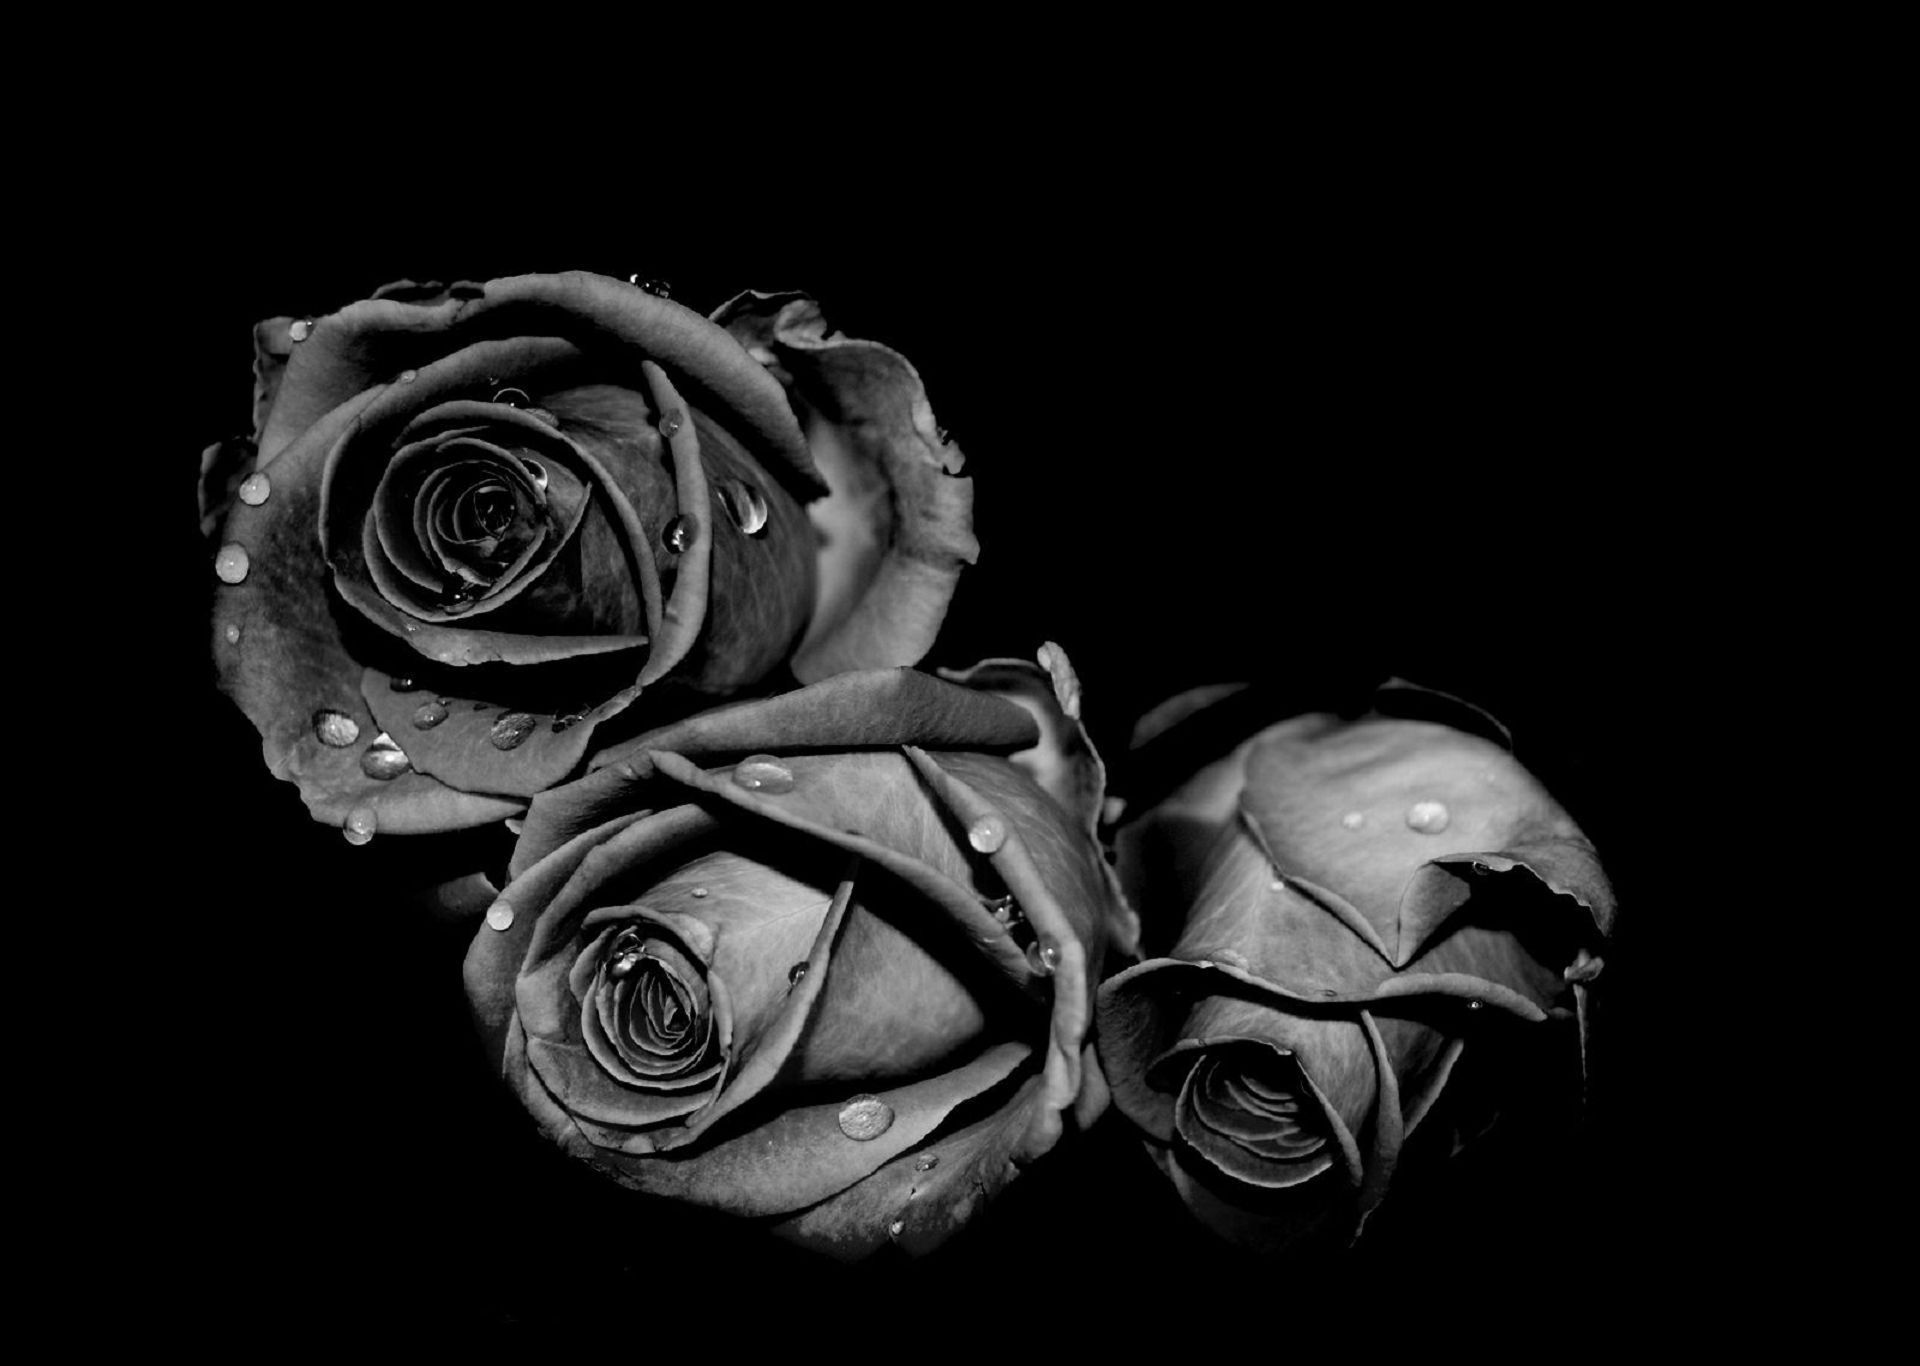 Black Rose Aesthetic Wallpapers on WallpaperDog